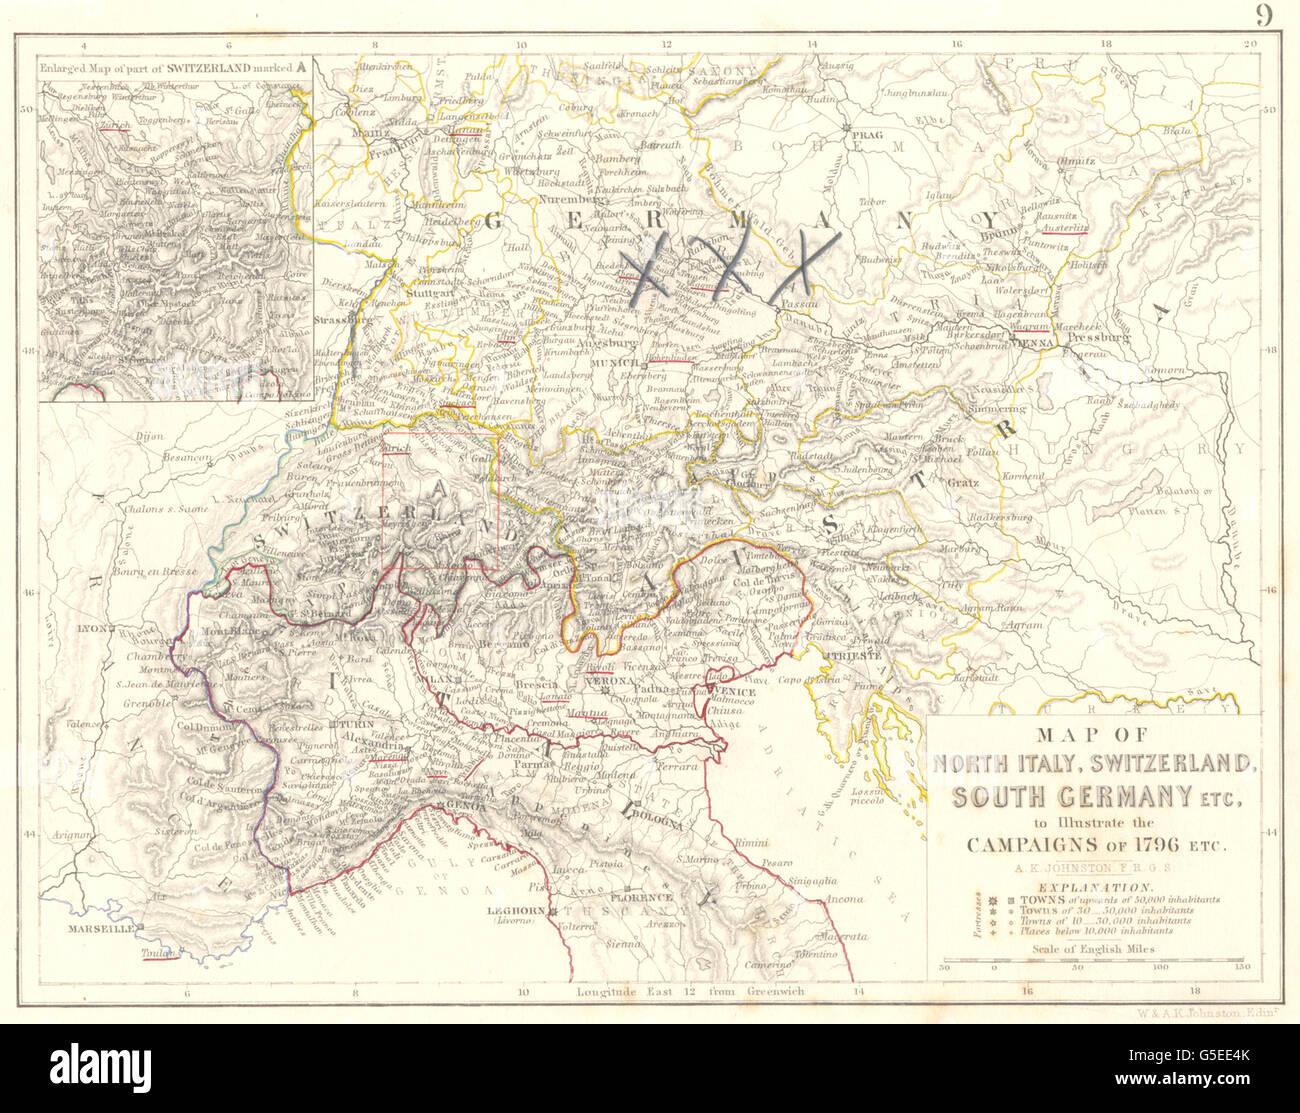 Germany switzerland italy stock photos germany switzerland italy 1796 campaign map north italy switzerland south germany 1848 stock image gumiabroncs Choice Image